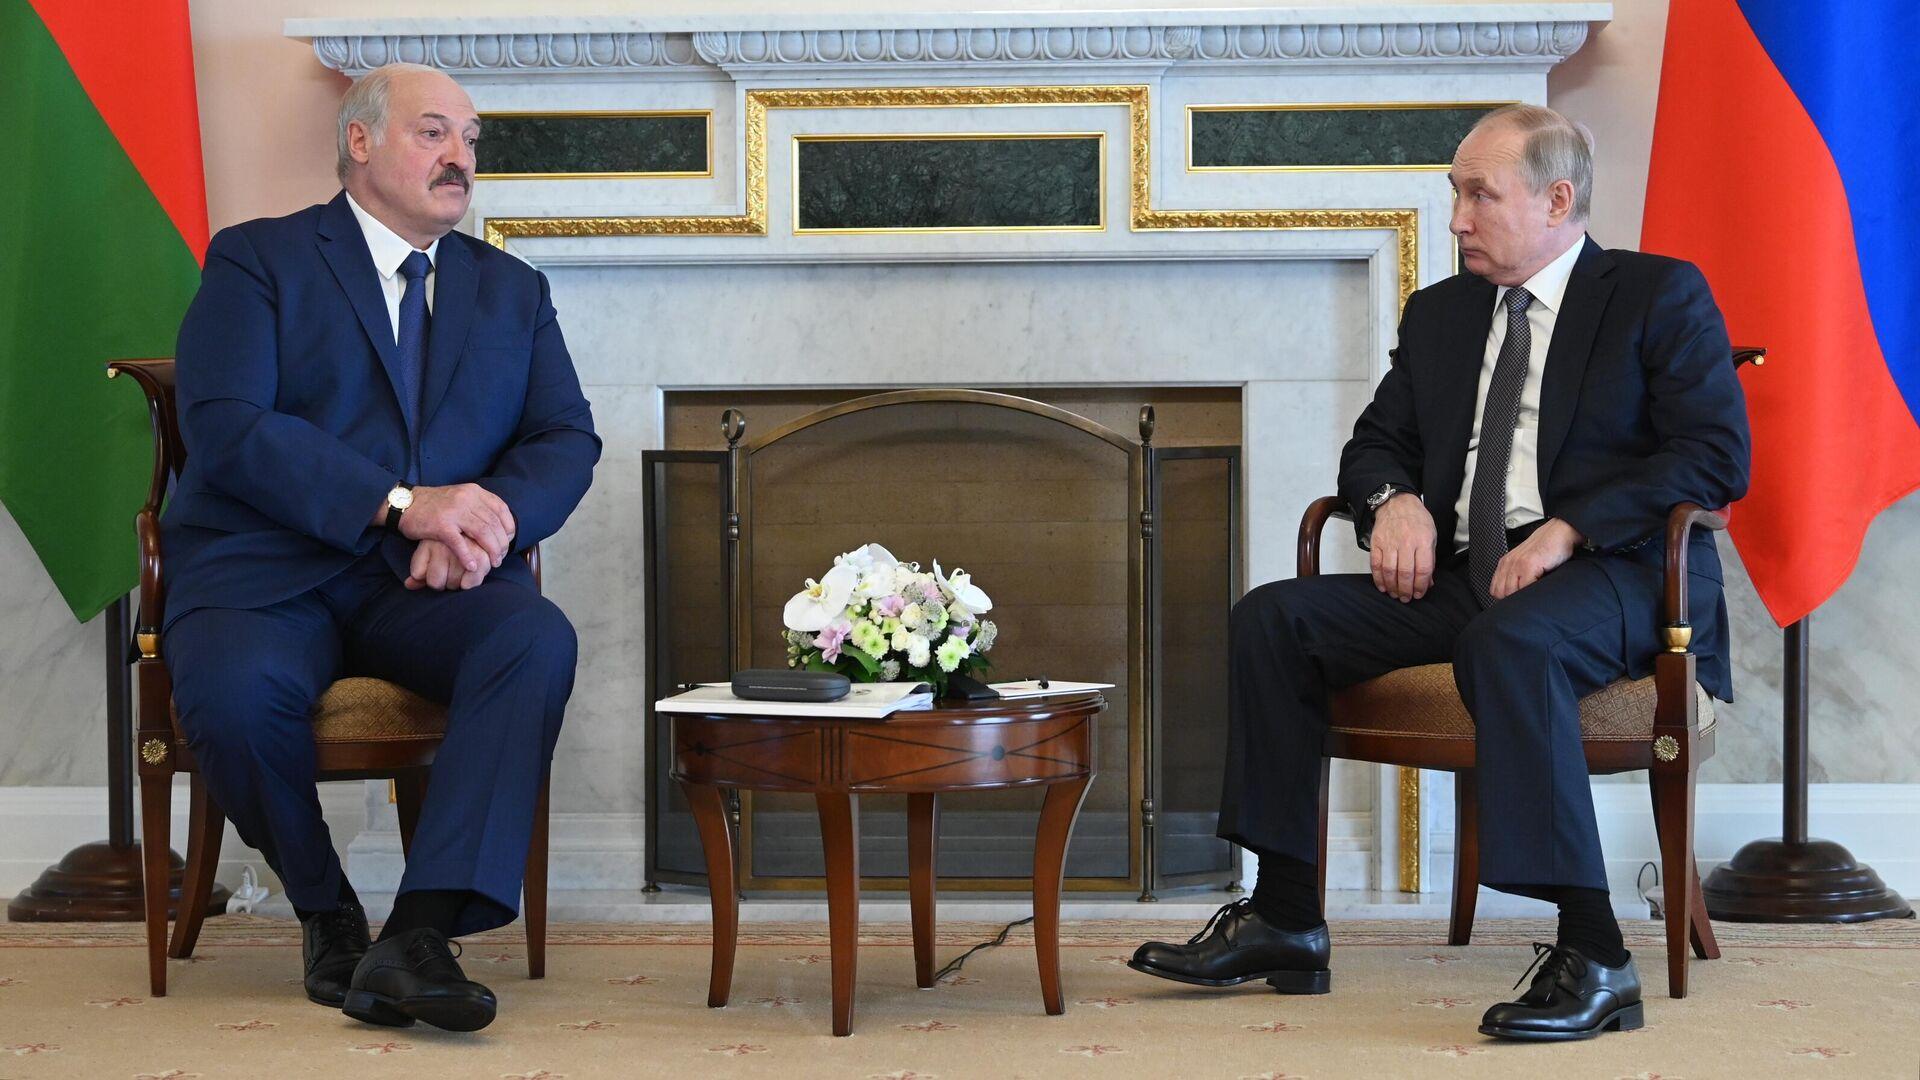 Президент РФ Владимир Путин и президент Беларуси Александр Лукашенко во время встречи 13 июля 2021 года - Sputnik Латвия, 1920, 13.07.2021